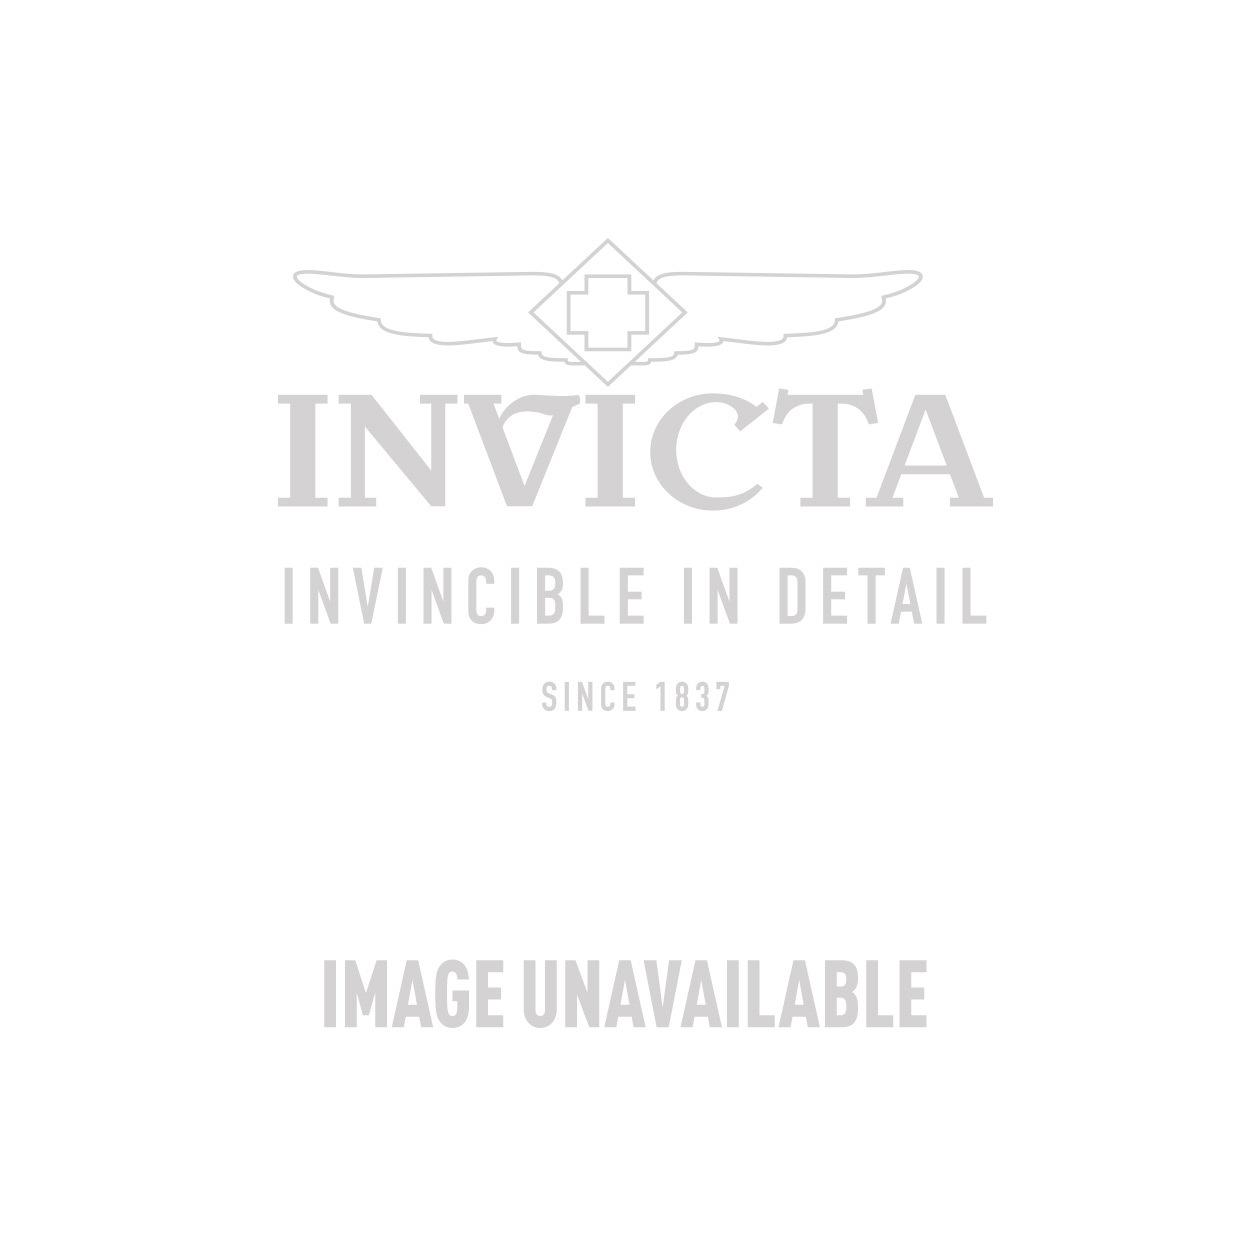 Invicta Sea Hunter Swiss Made Quartz Watch - Rose Gold case with Black tone Polyurethane band - Model 0416